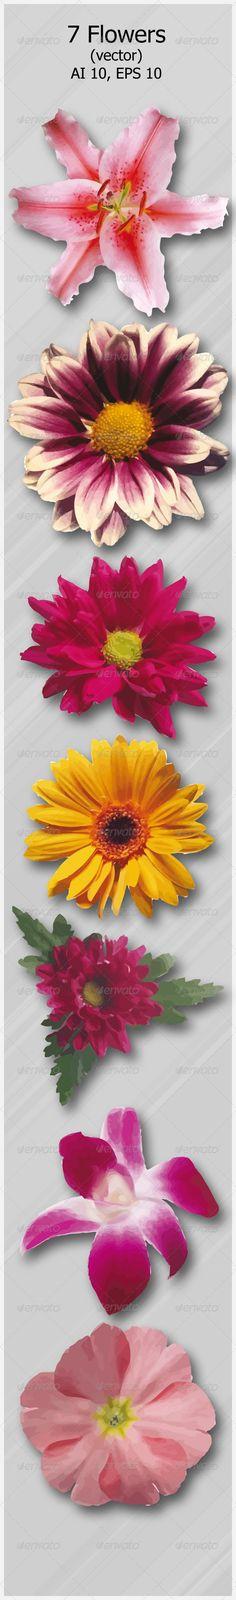 7 Flowers